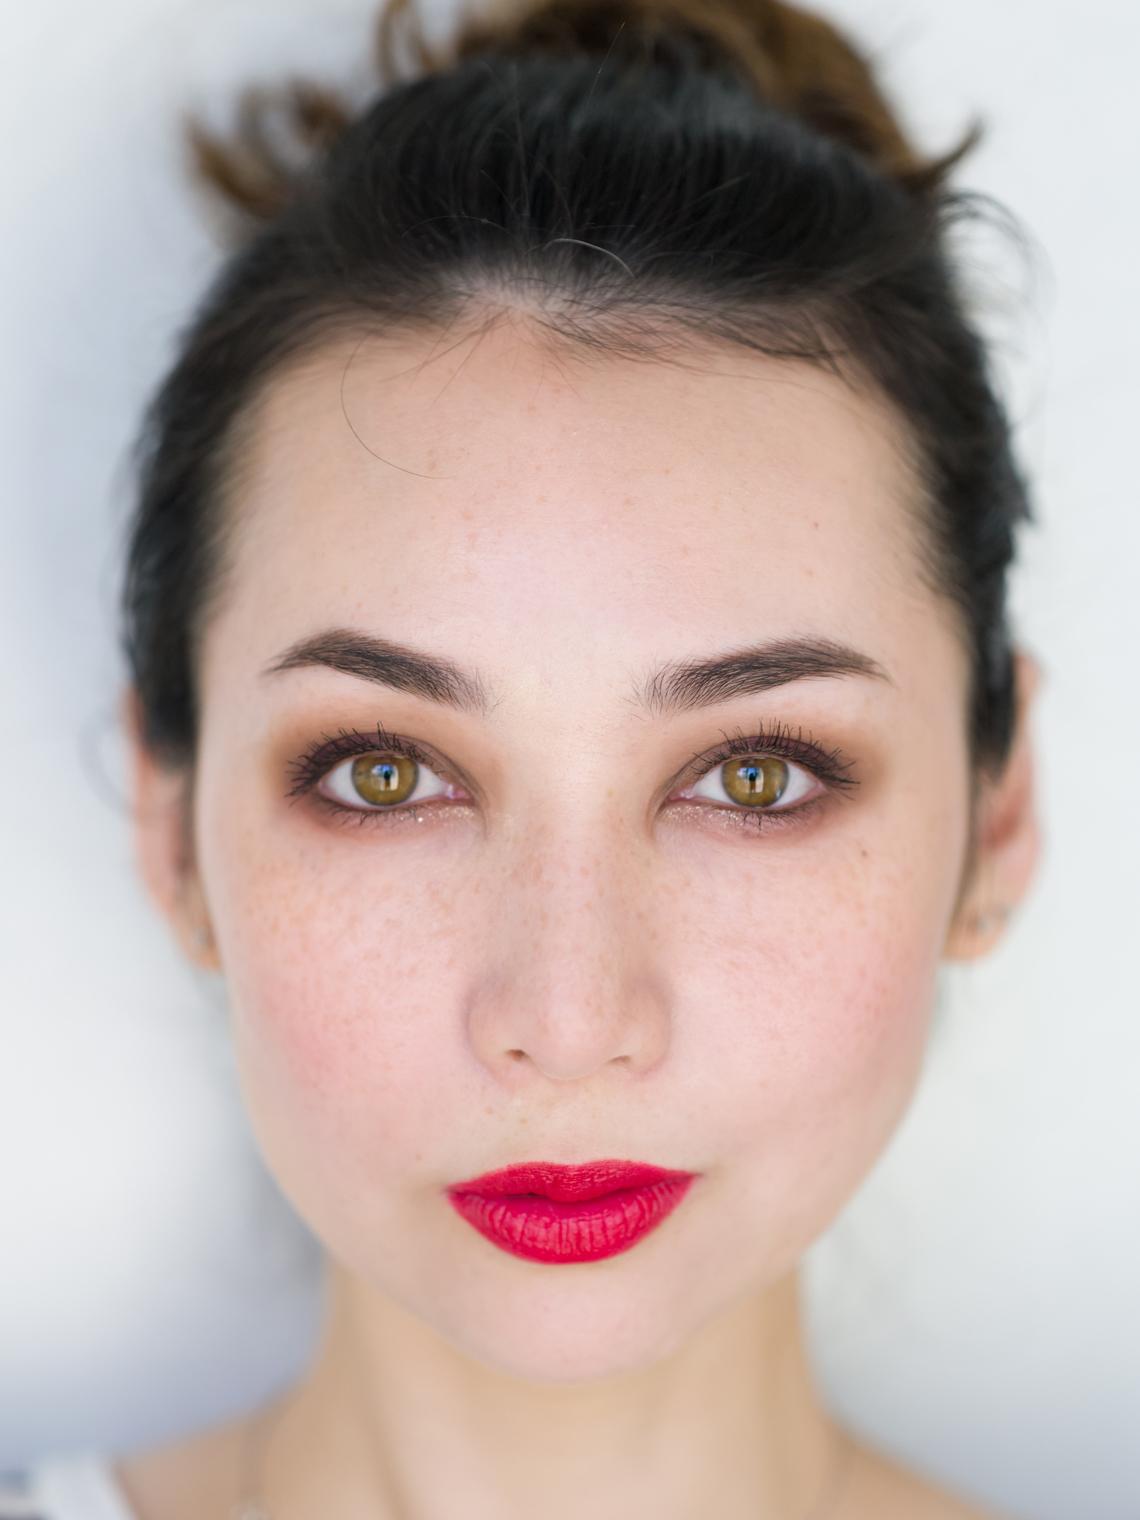 singaporebeautyblogger_emilyloke_makeupinspiration1